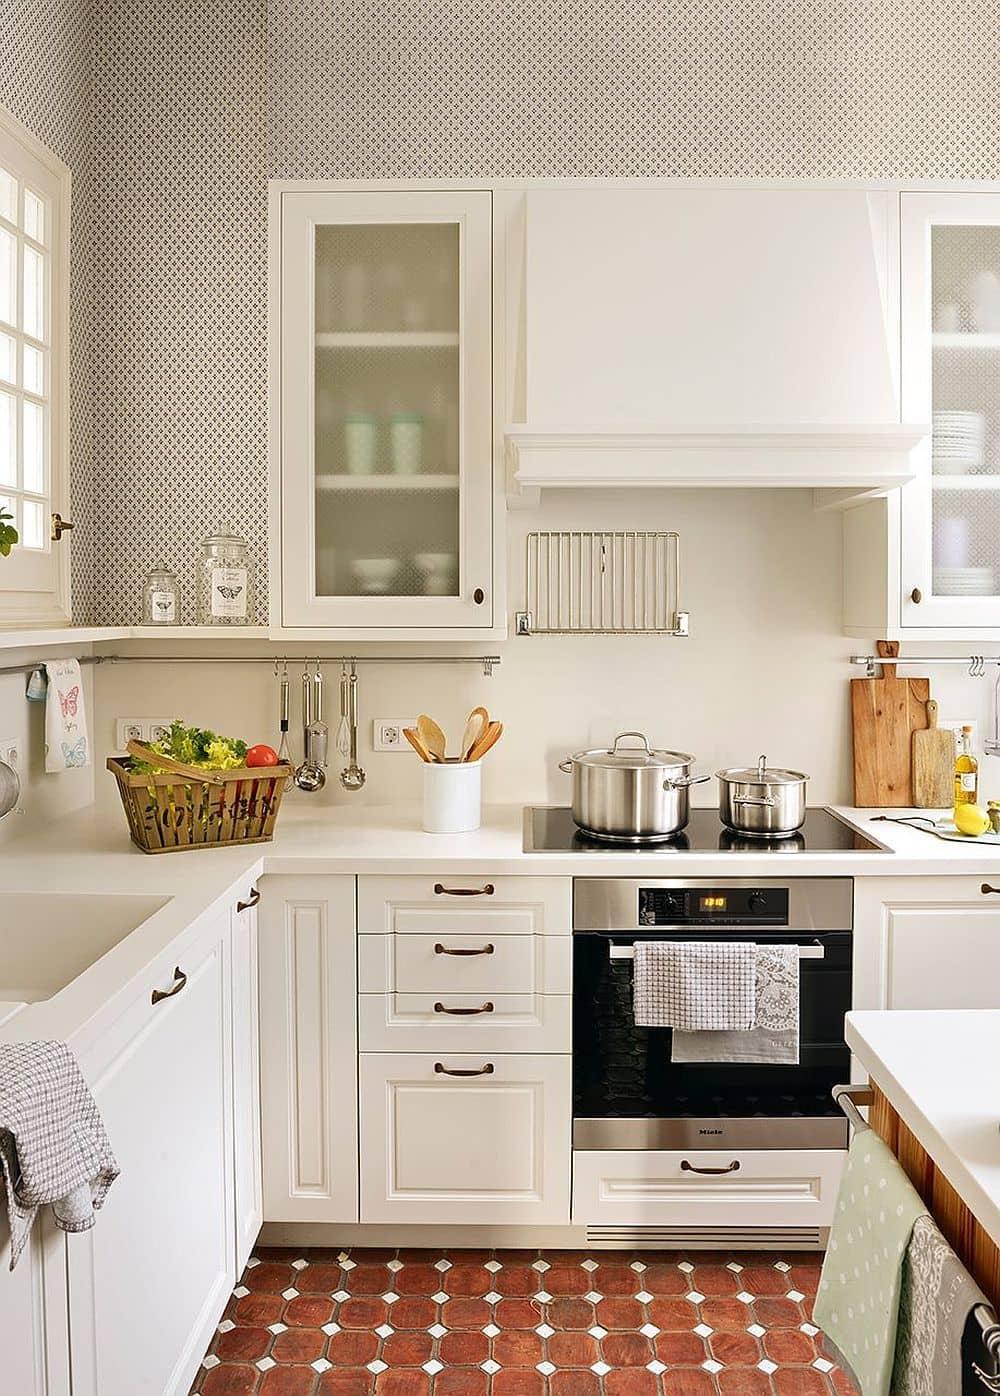 Cocina pequeña moderna en color blanco.